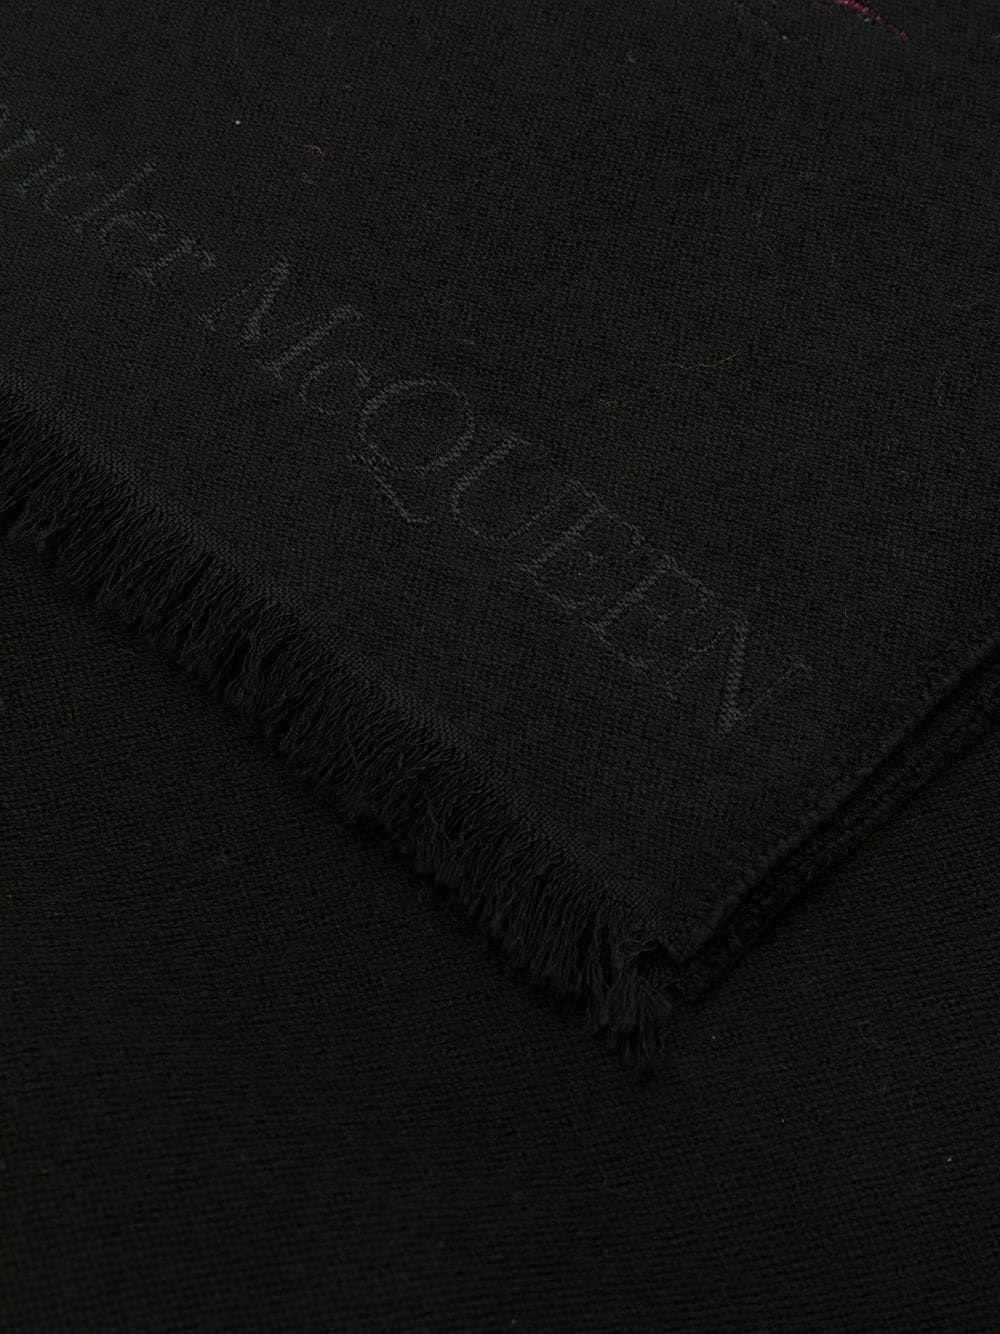 ALEXANDER MCQUEEN WOMEN'S 5781793B84Q1000 BLACK WOOL SCARF